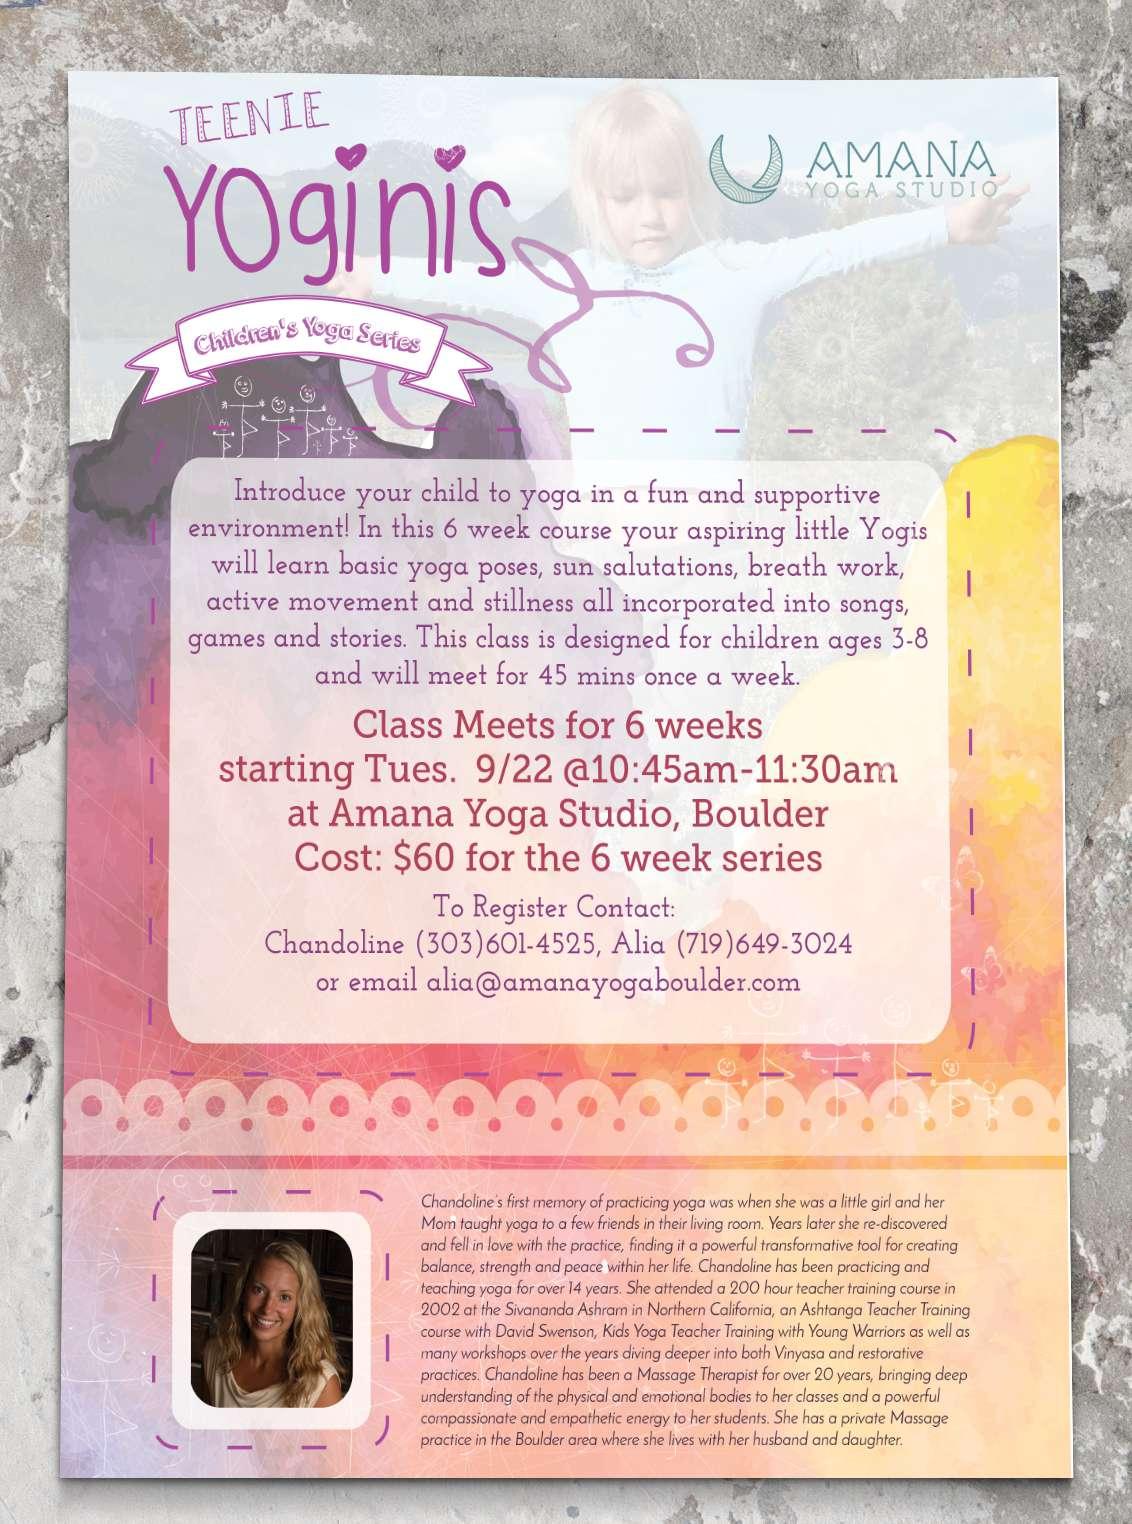 Inspwired Flyer Design   Amana Yoga